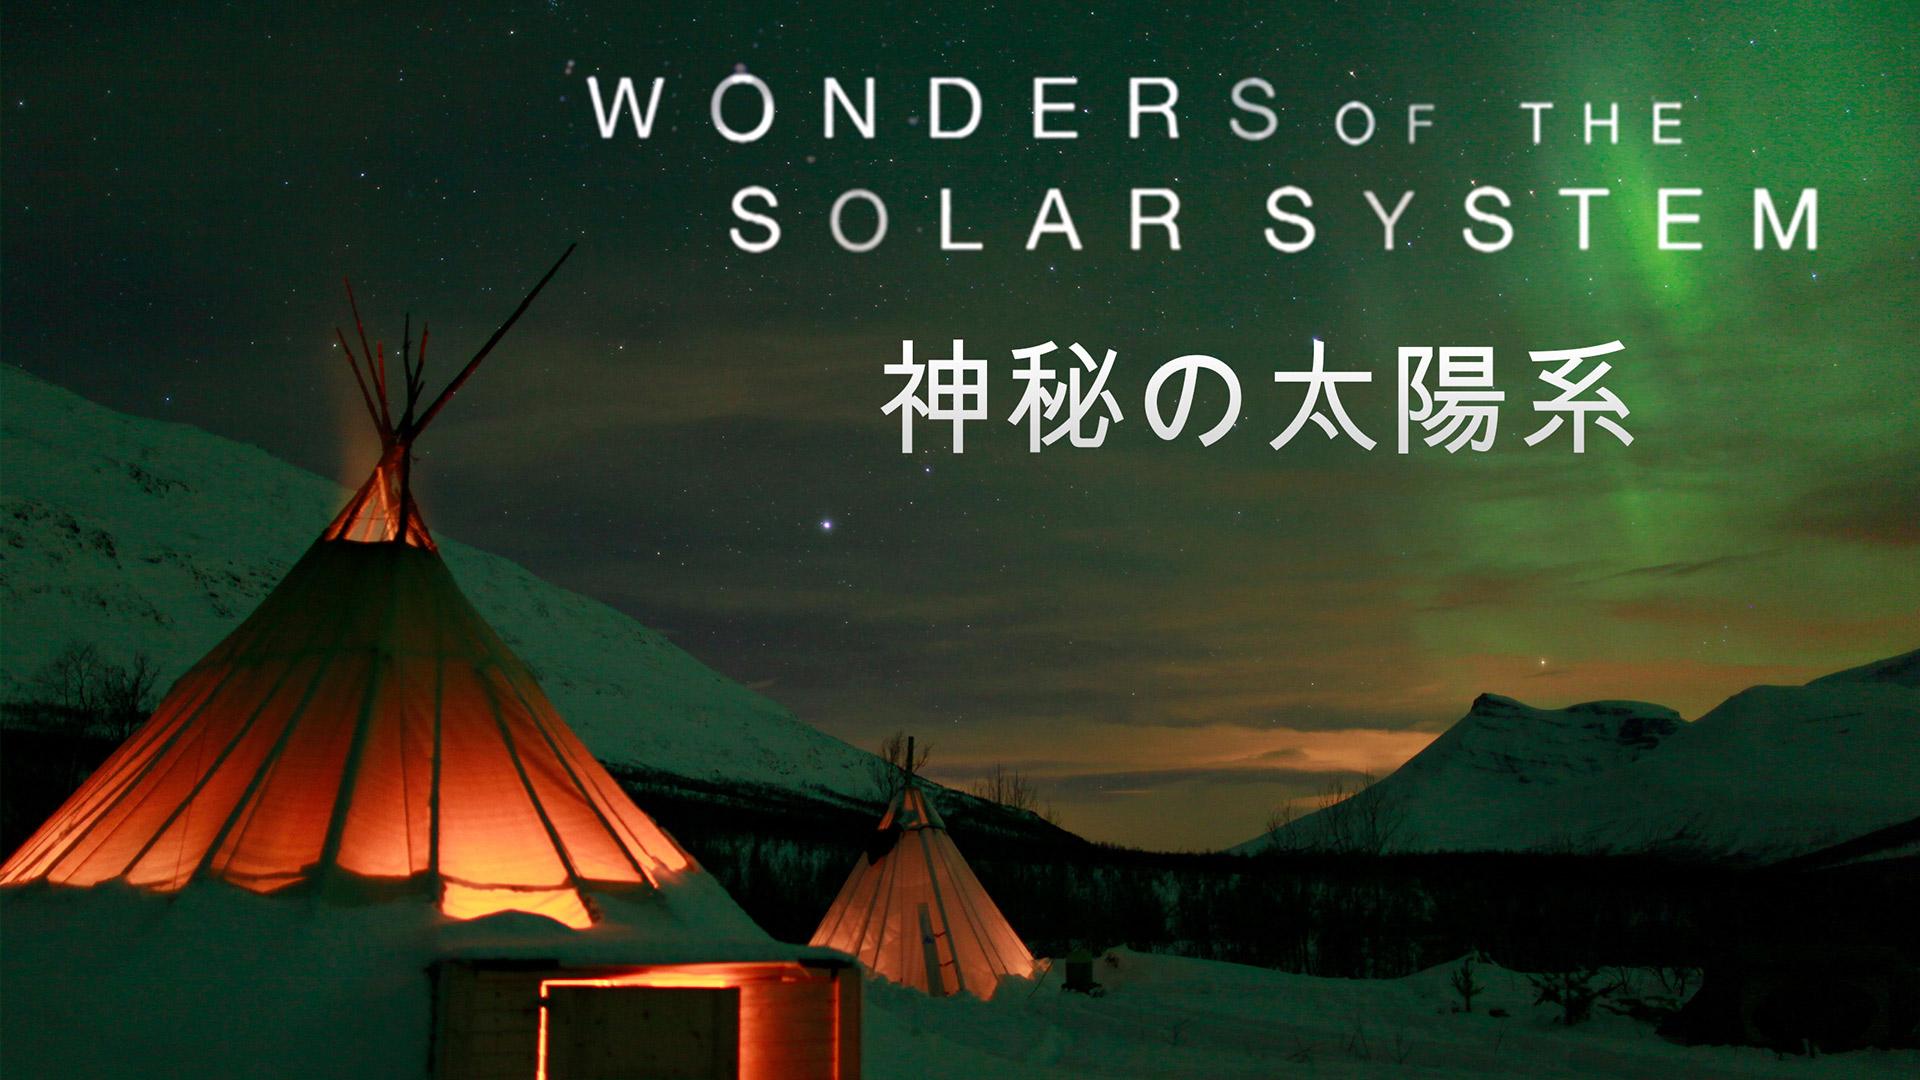 神秘の太陽系 (吹替版)